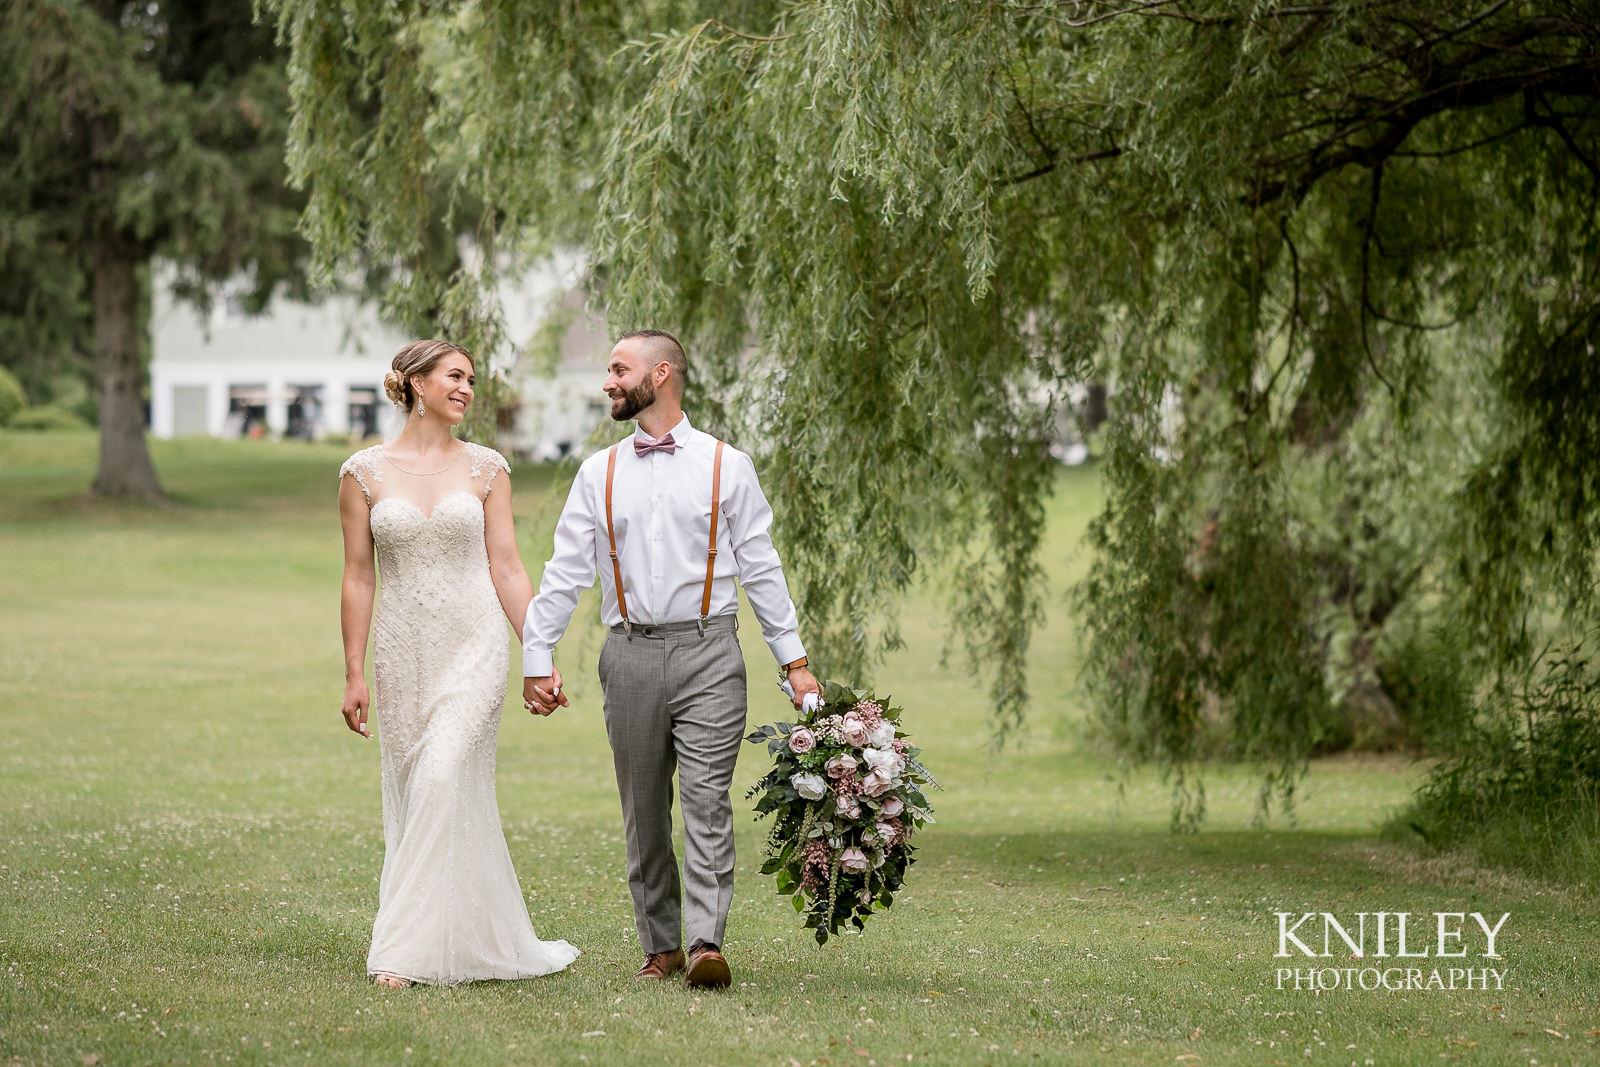 075 - Ontario Golf Club Wedding Pictures - XT2B8735.jpg